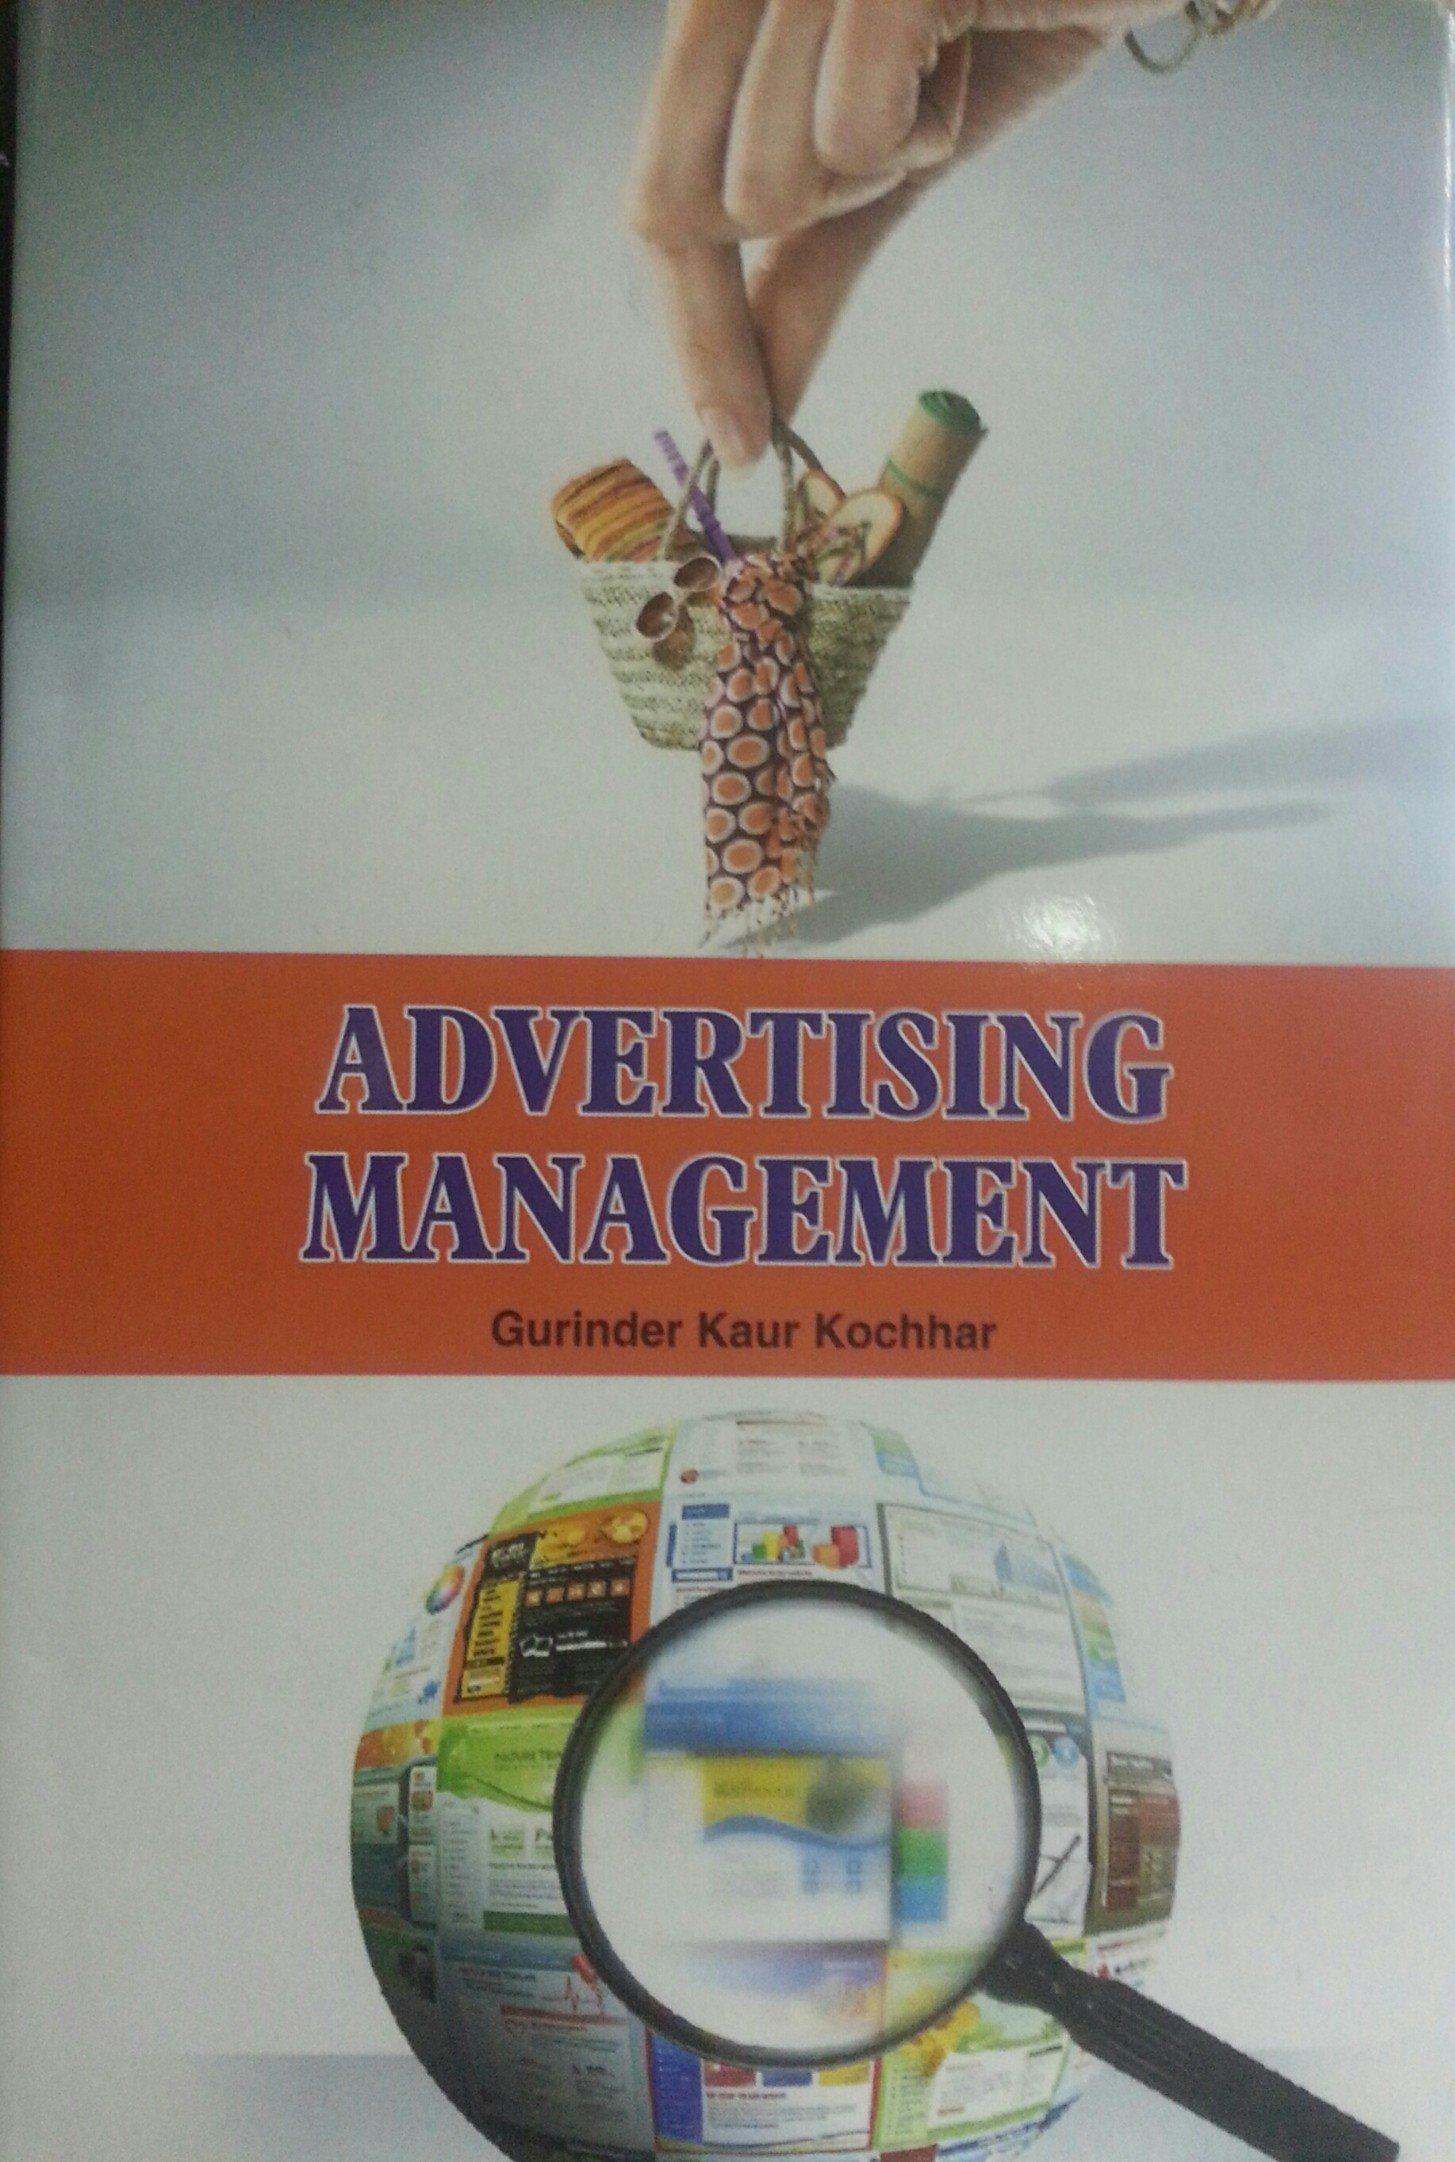 Advertising Management - Gurinder Kaur Kochhar